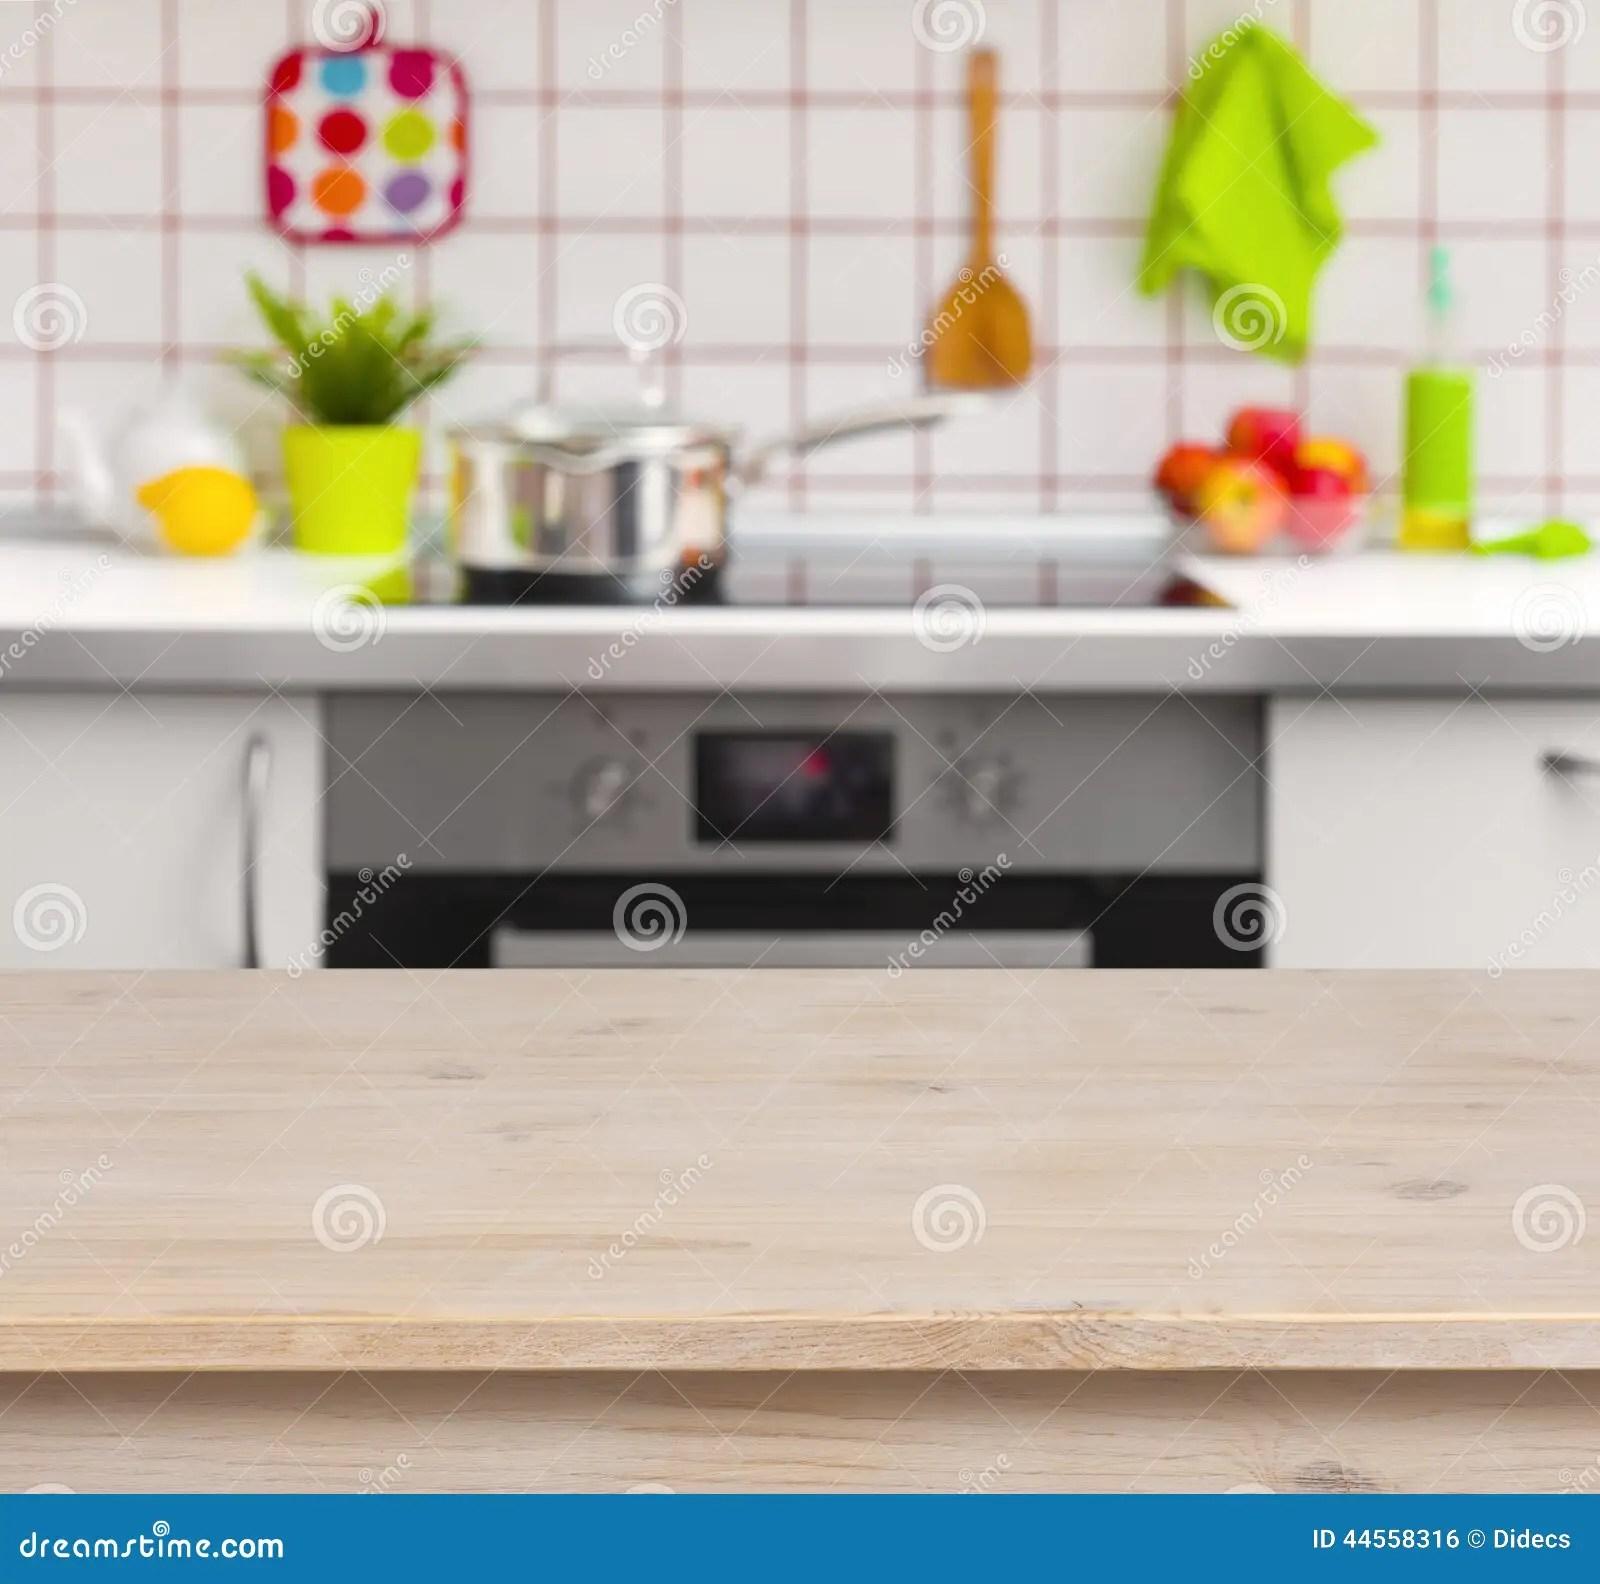 kitchen banquette how to repair faucet 在被弄脏的厨房长凳背景的木桌库存照片 图片包括有广告 蓝色 颜色 在被弄脏的厨房长凳背景的木桌